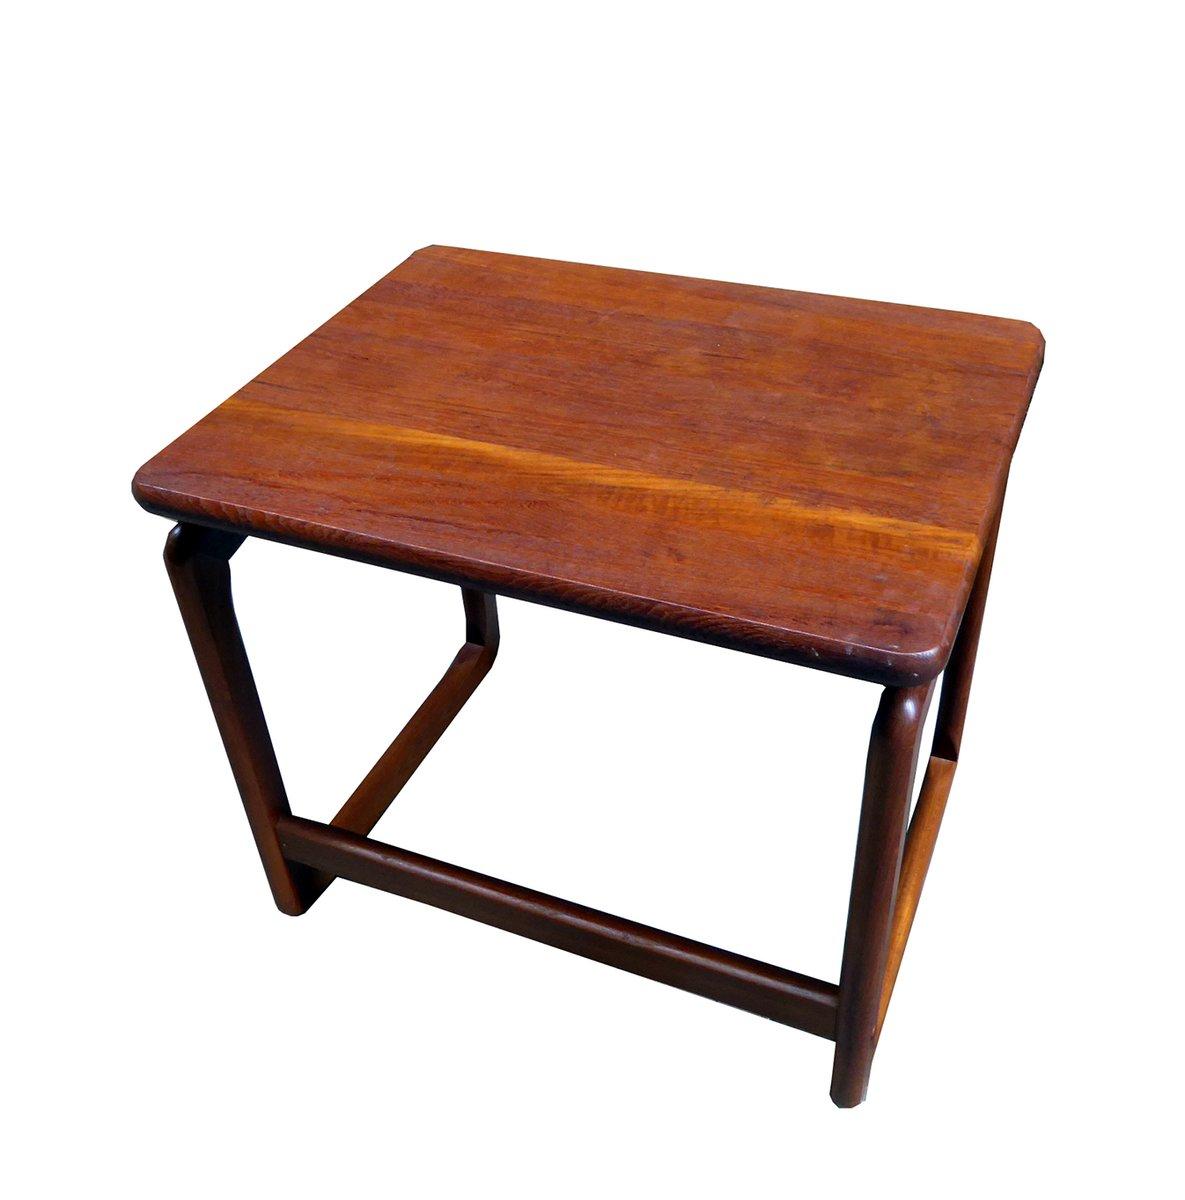 Danish Teak Coffee Table 1950s For Sale At Pamono